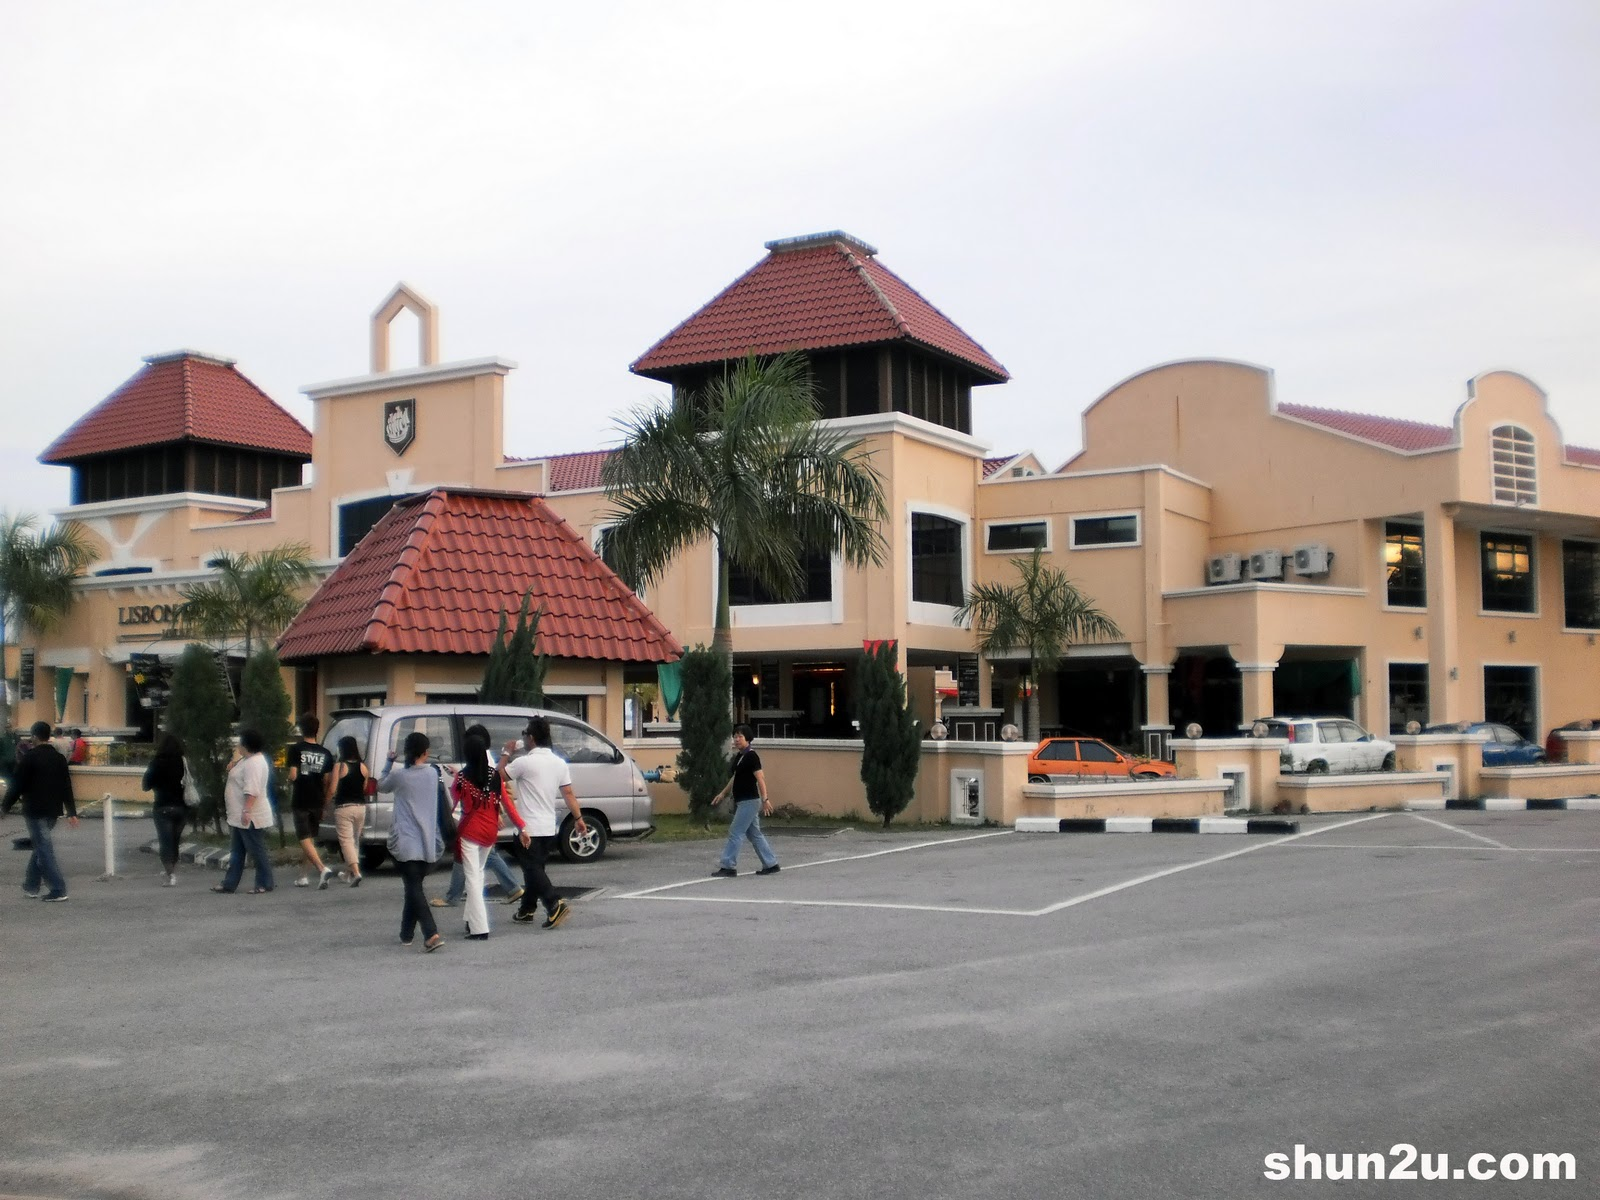 Shun2u.com: Portuguese Village Melaka aka Portuguese